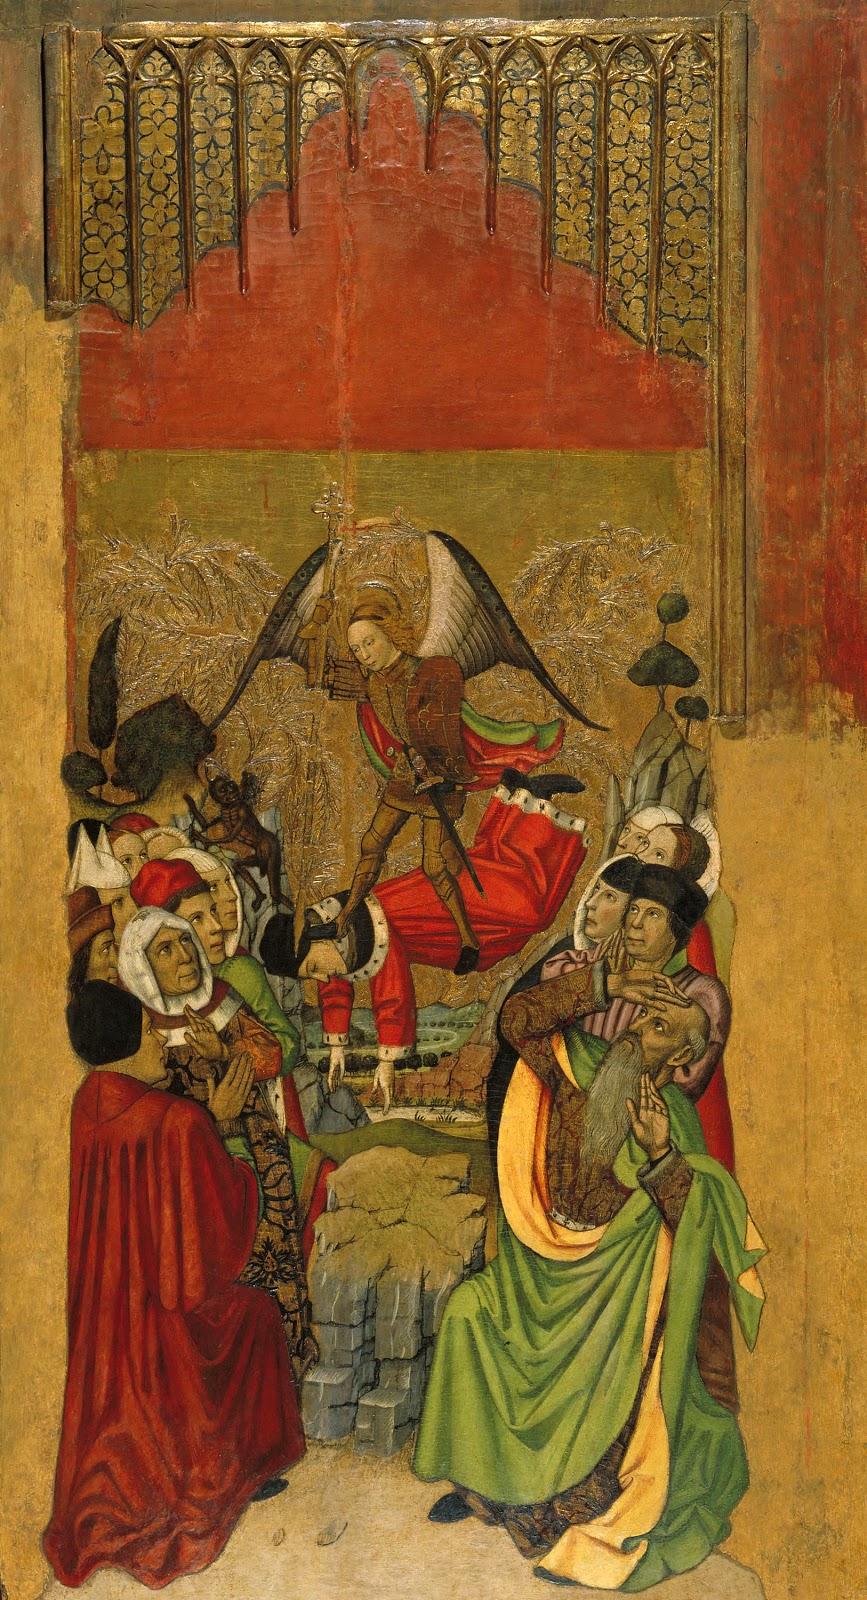 Jaume Huguet saint michael vanquishes the antichrist